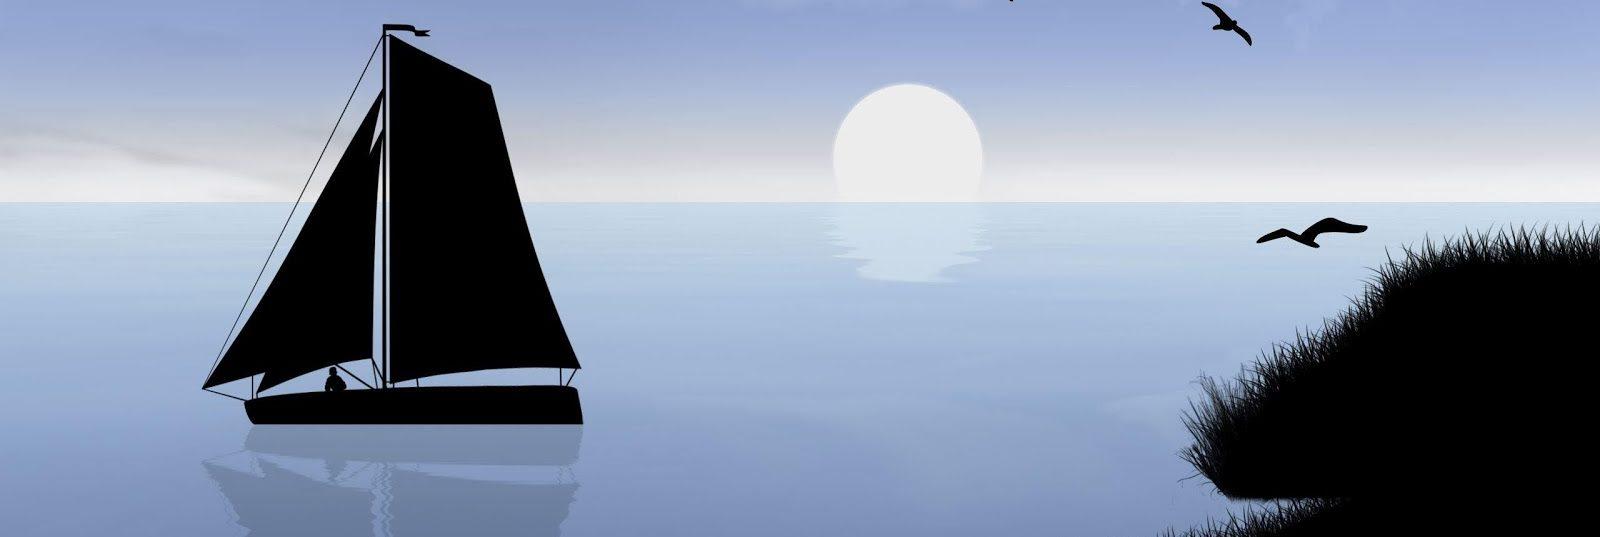 Журнал о людях, море и кораблях CofranceSARL